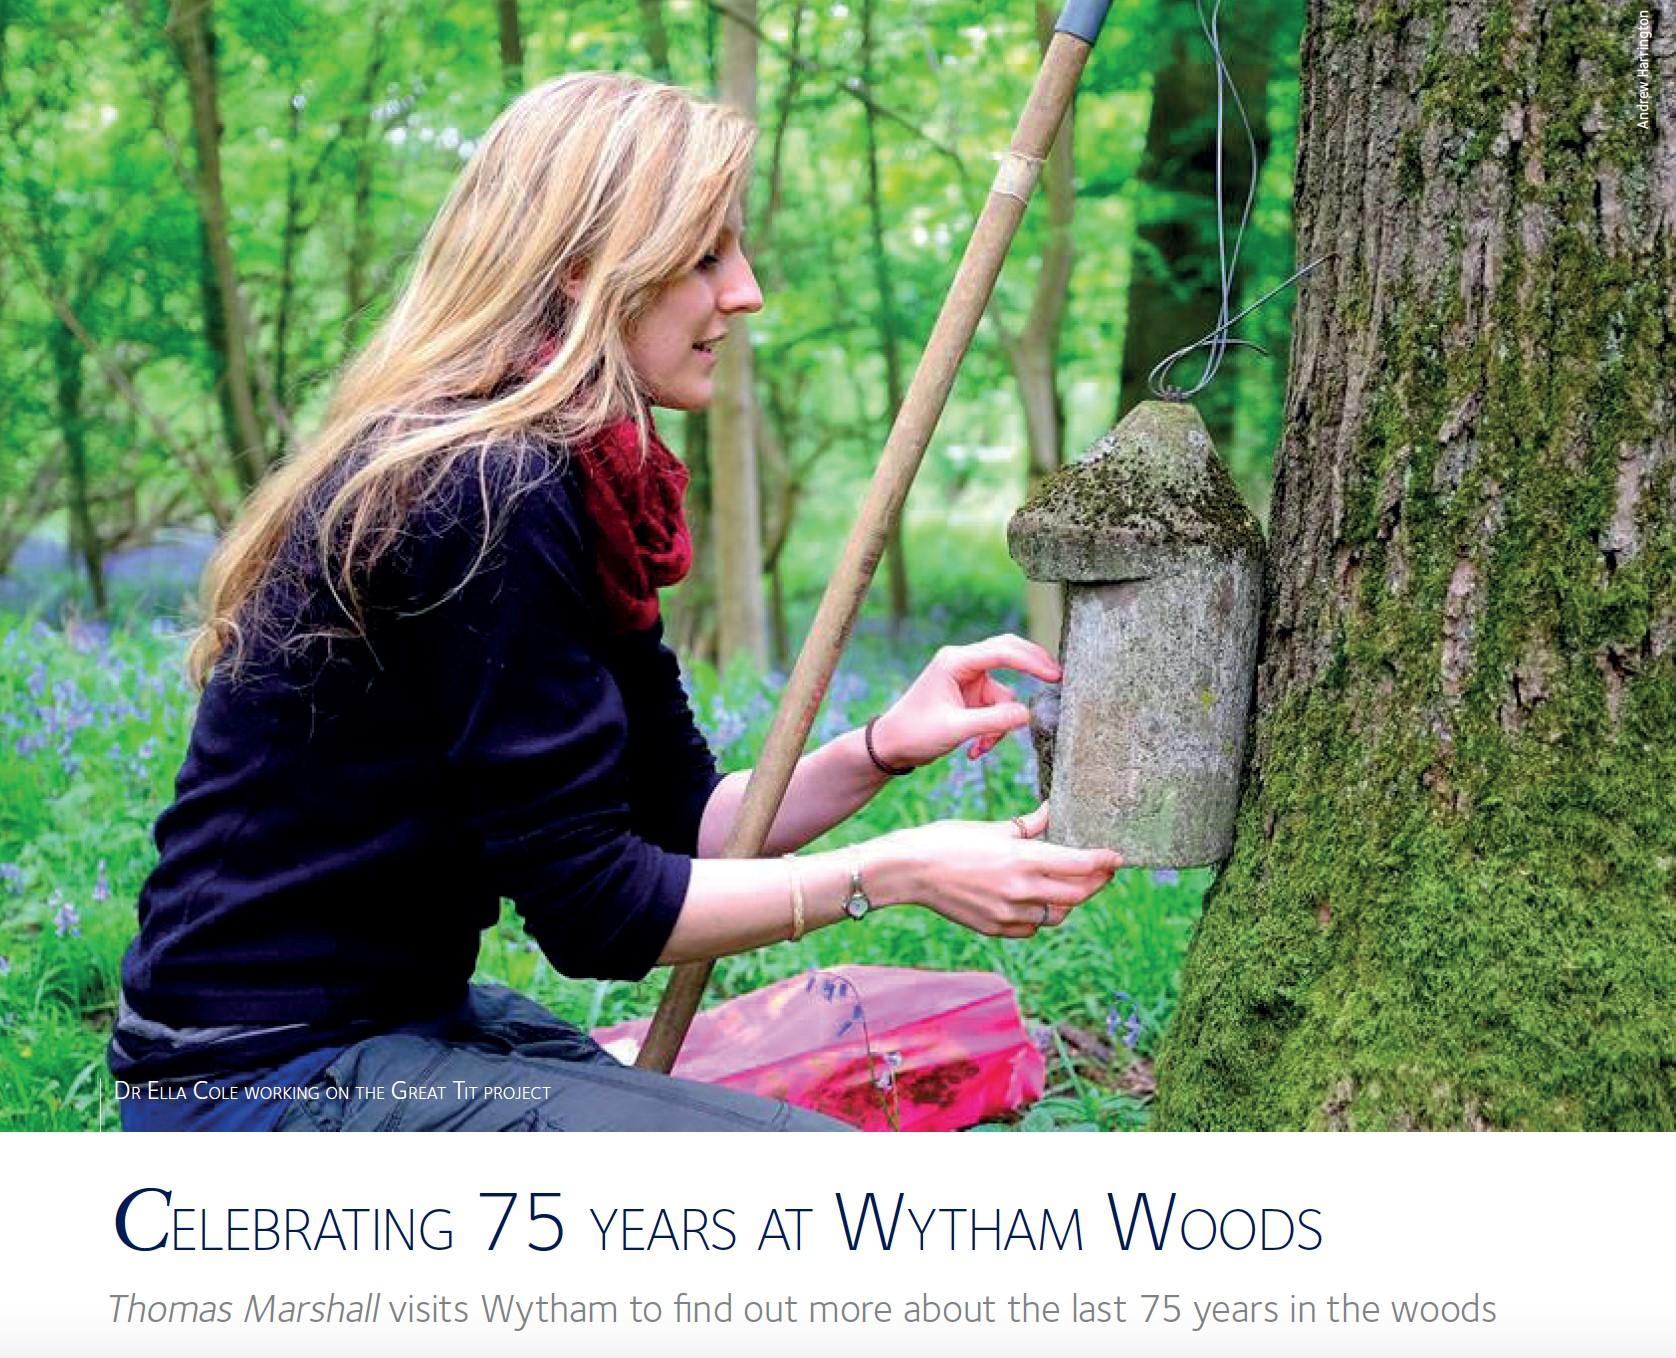 Celebrating-75-years-at-Wytham-Woods.jpg